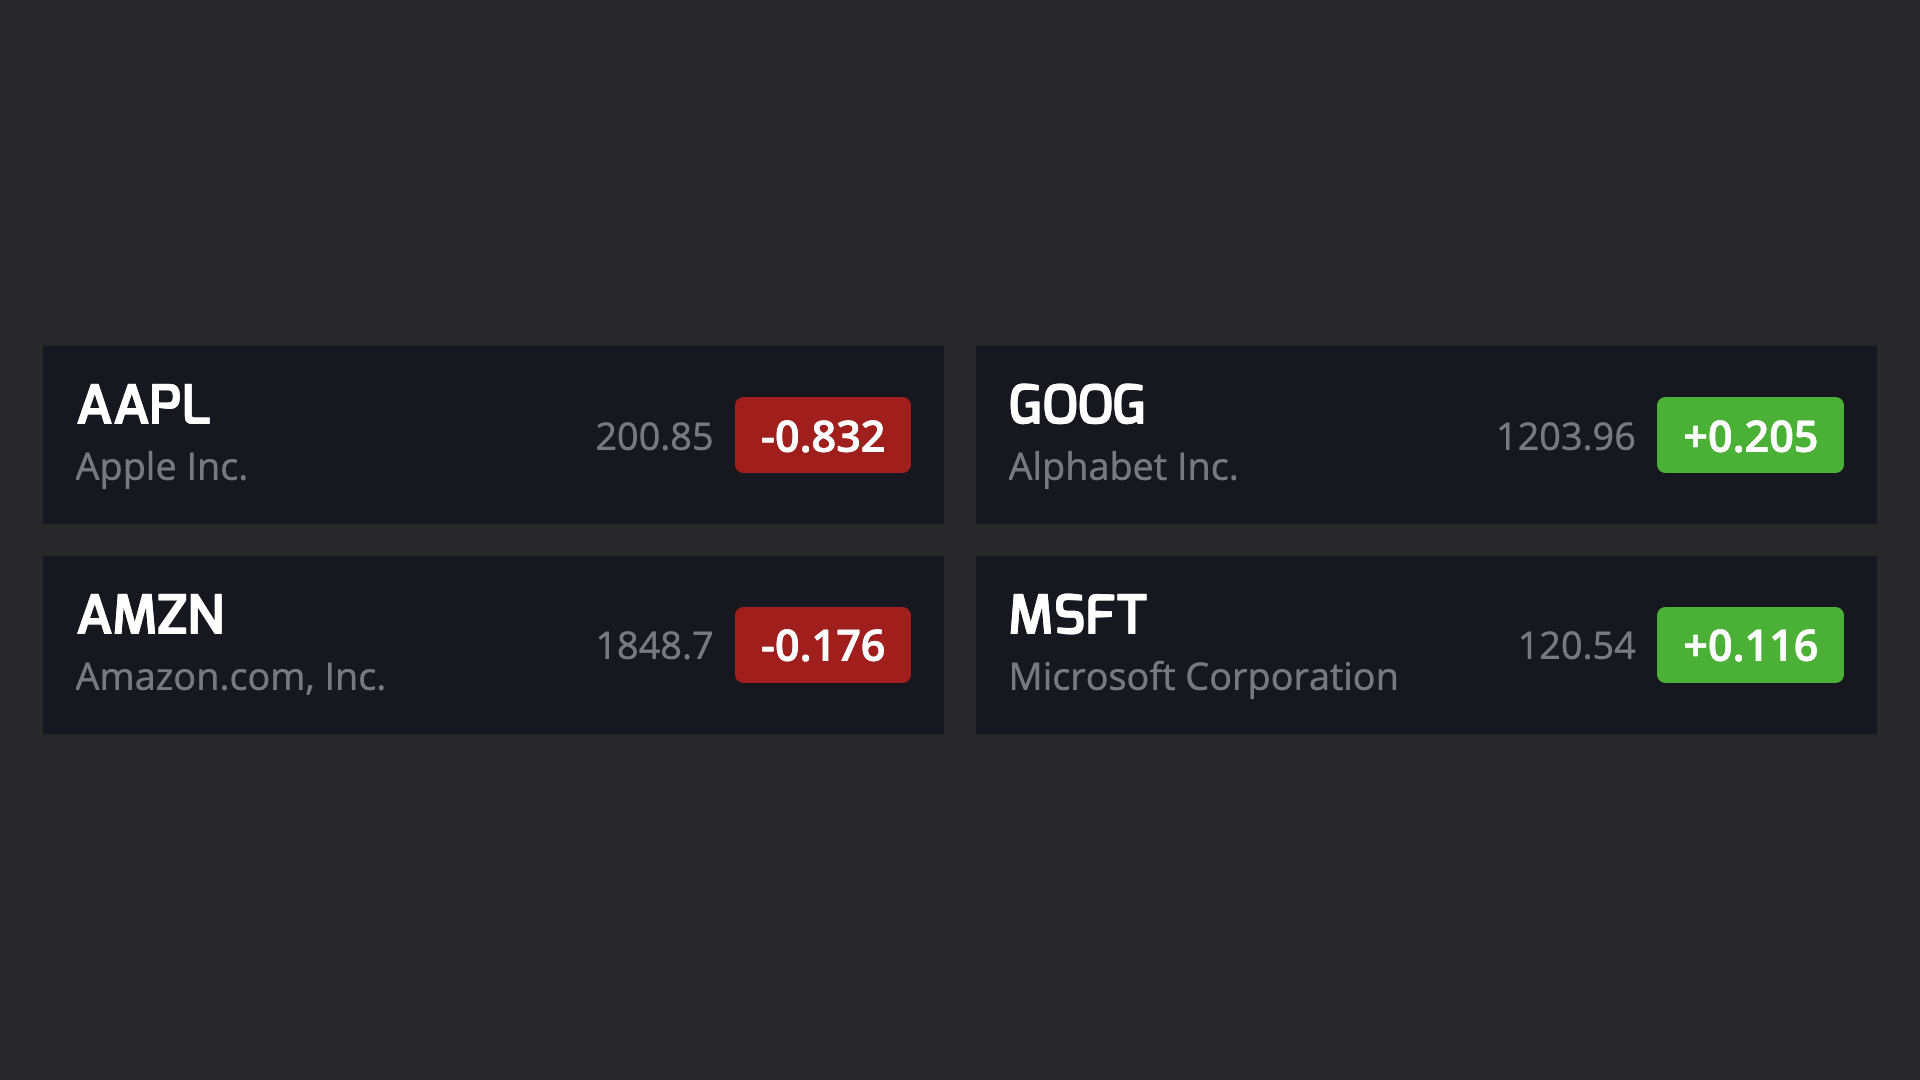 Stocks App for Digital Signage image carousel